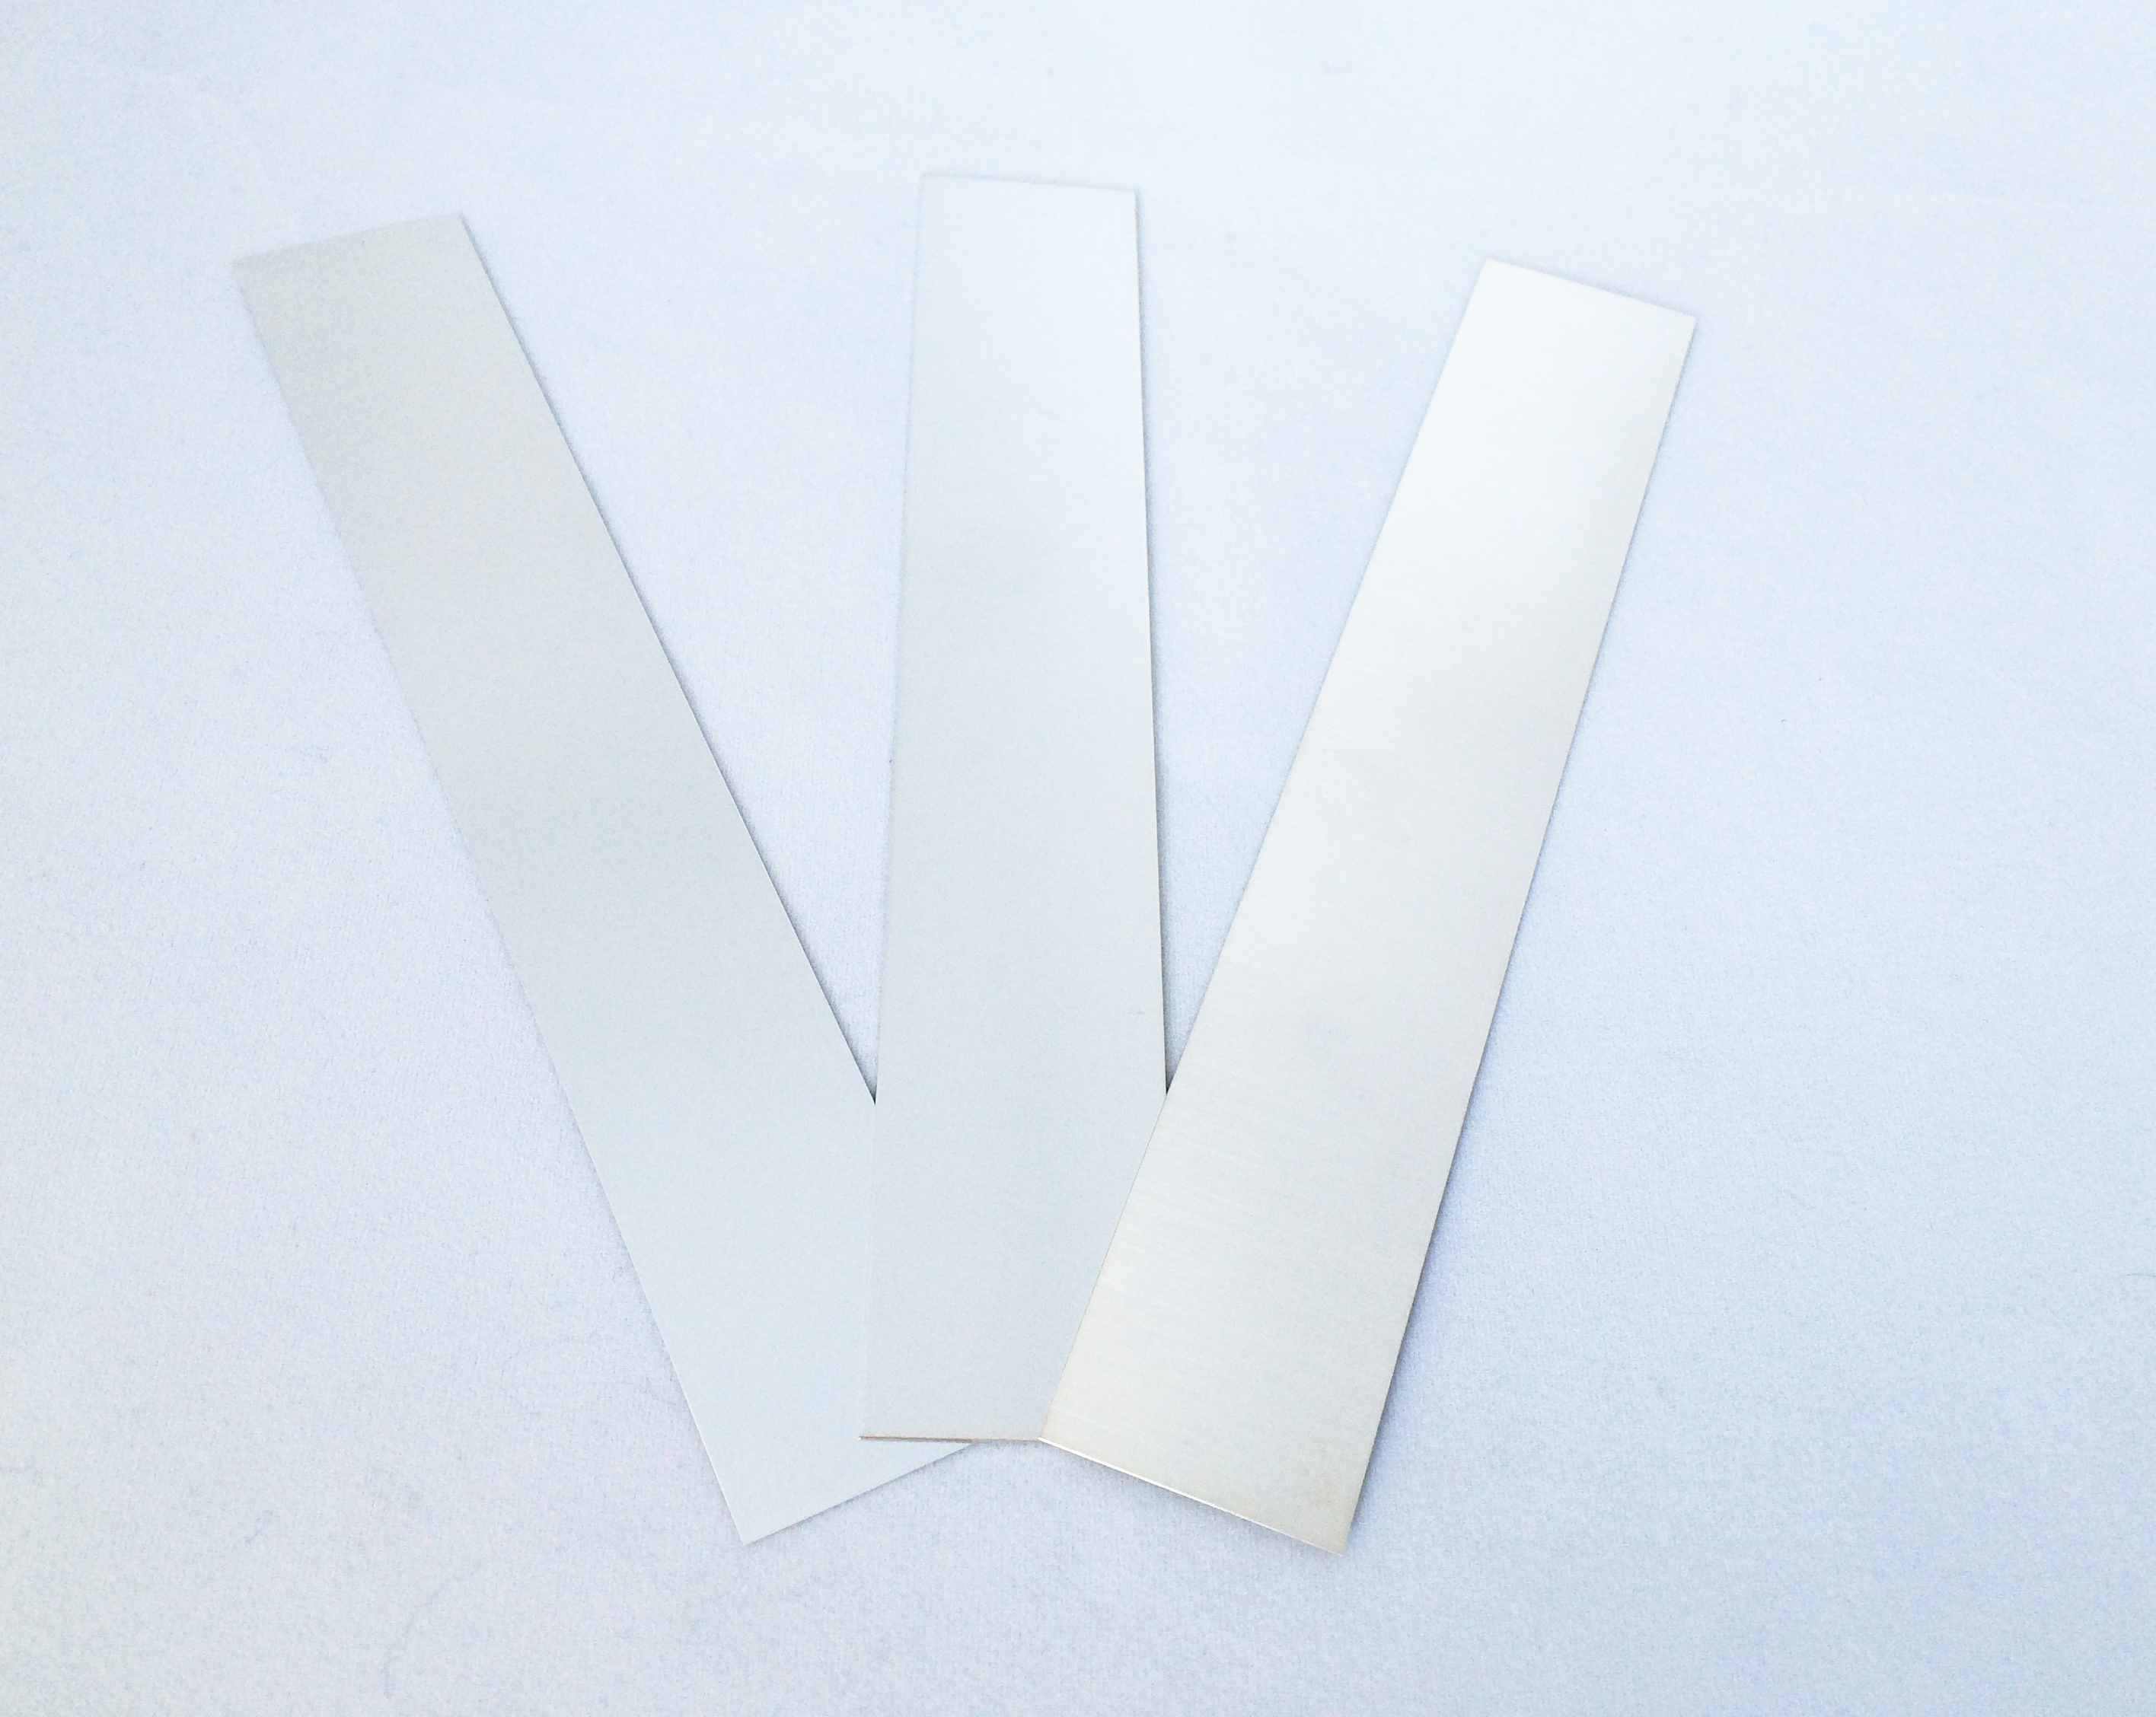 925 Sterling Silver Sheet 6 X 1 9 34 Gauge Rectangle